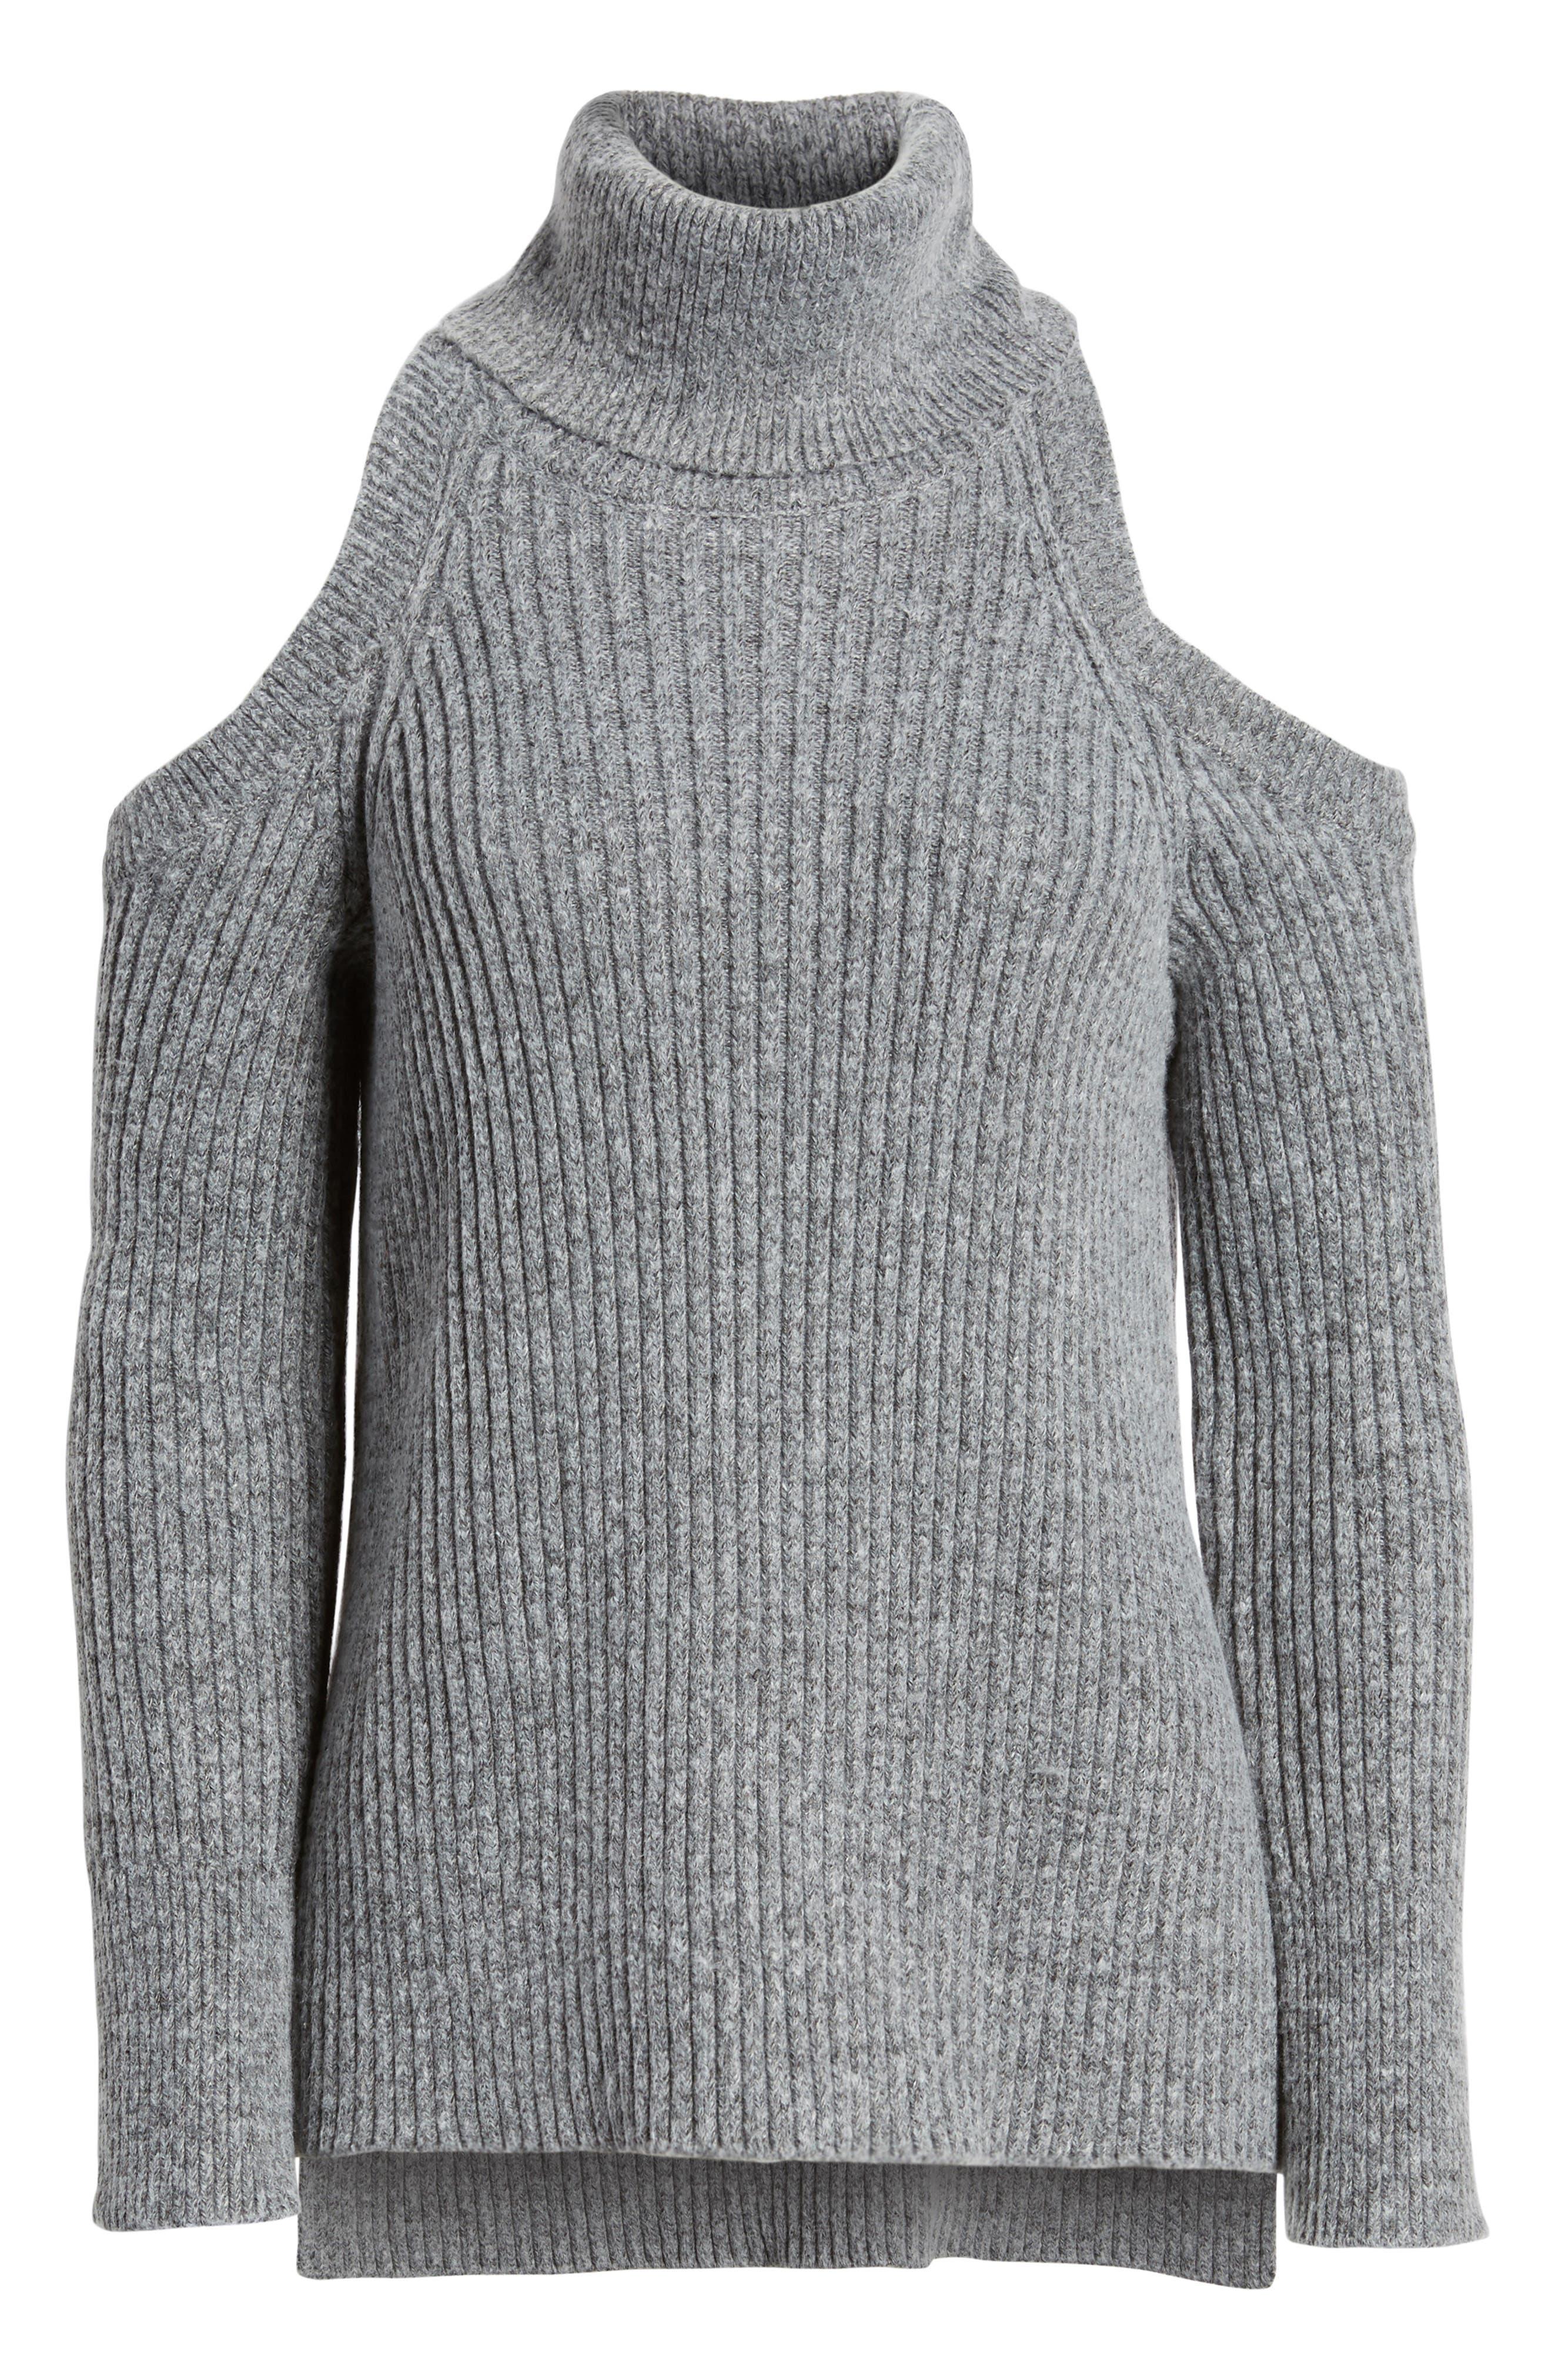 Rodell Cold Shoulder Sweater,                             Alternate thumbnail 11, color,